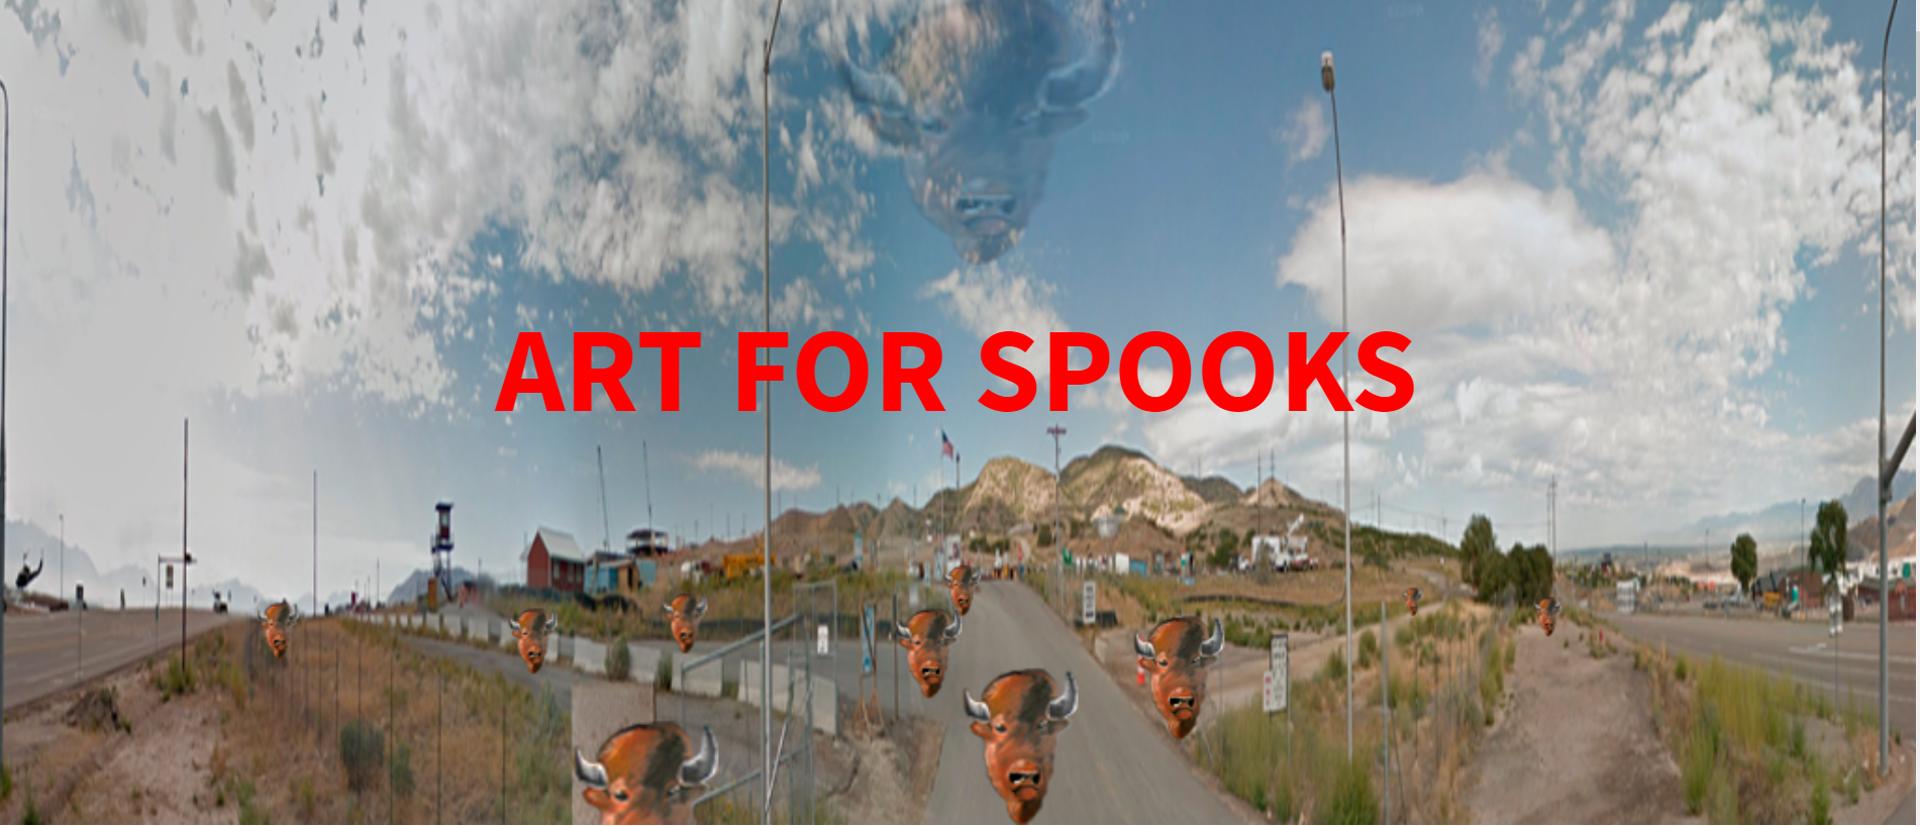 ©ISEA2015: 21st International Symposium on Electronic Art, Claudia Costa Pederson and Nicholas Knouf, Art for Spooks